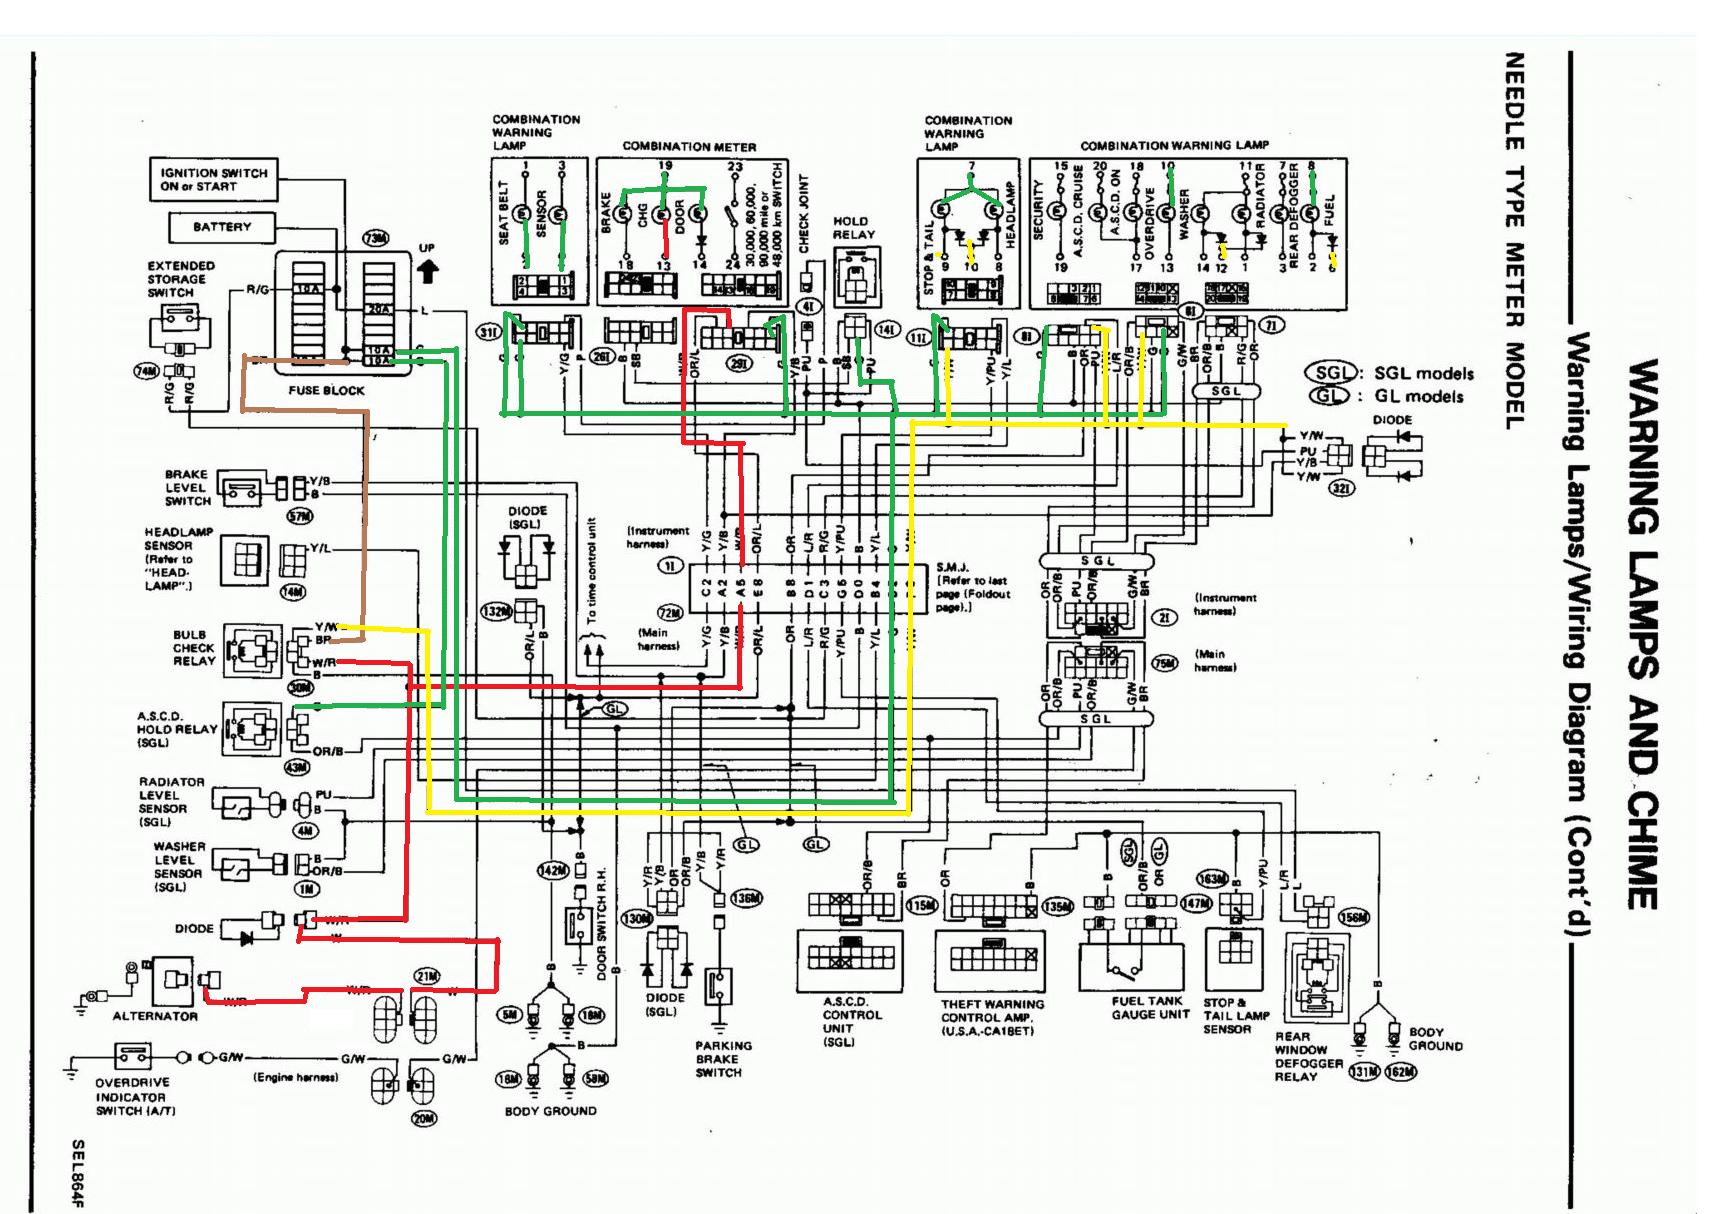 Wiring Harness Additionally Ka24de Wiring Diagram On S13 Sr20det